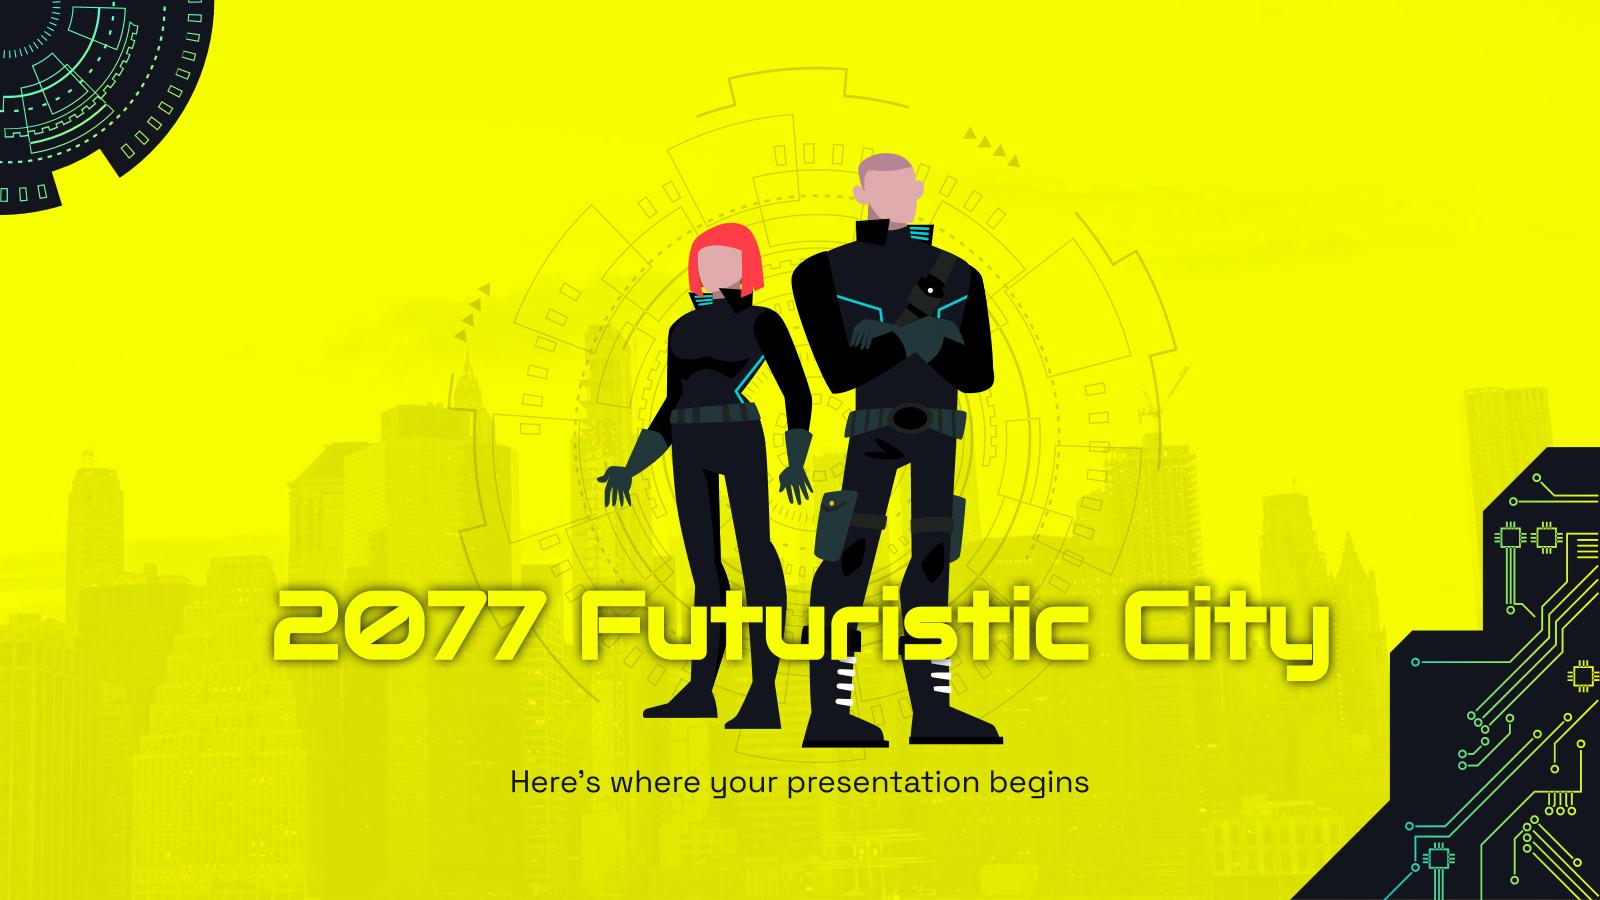 2077 Futuristic City presentation template